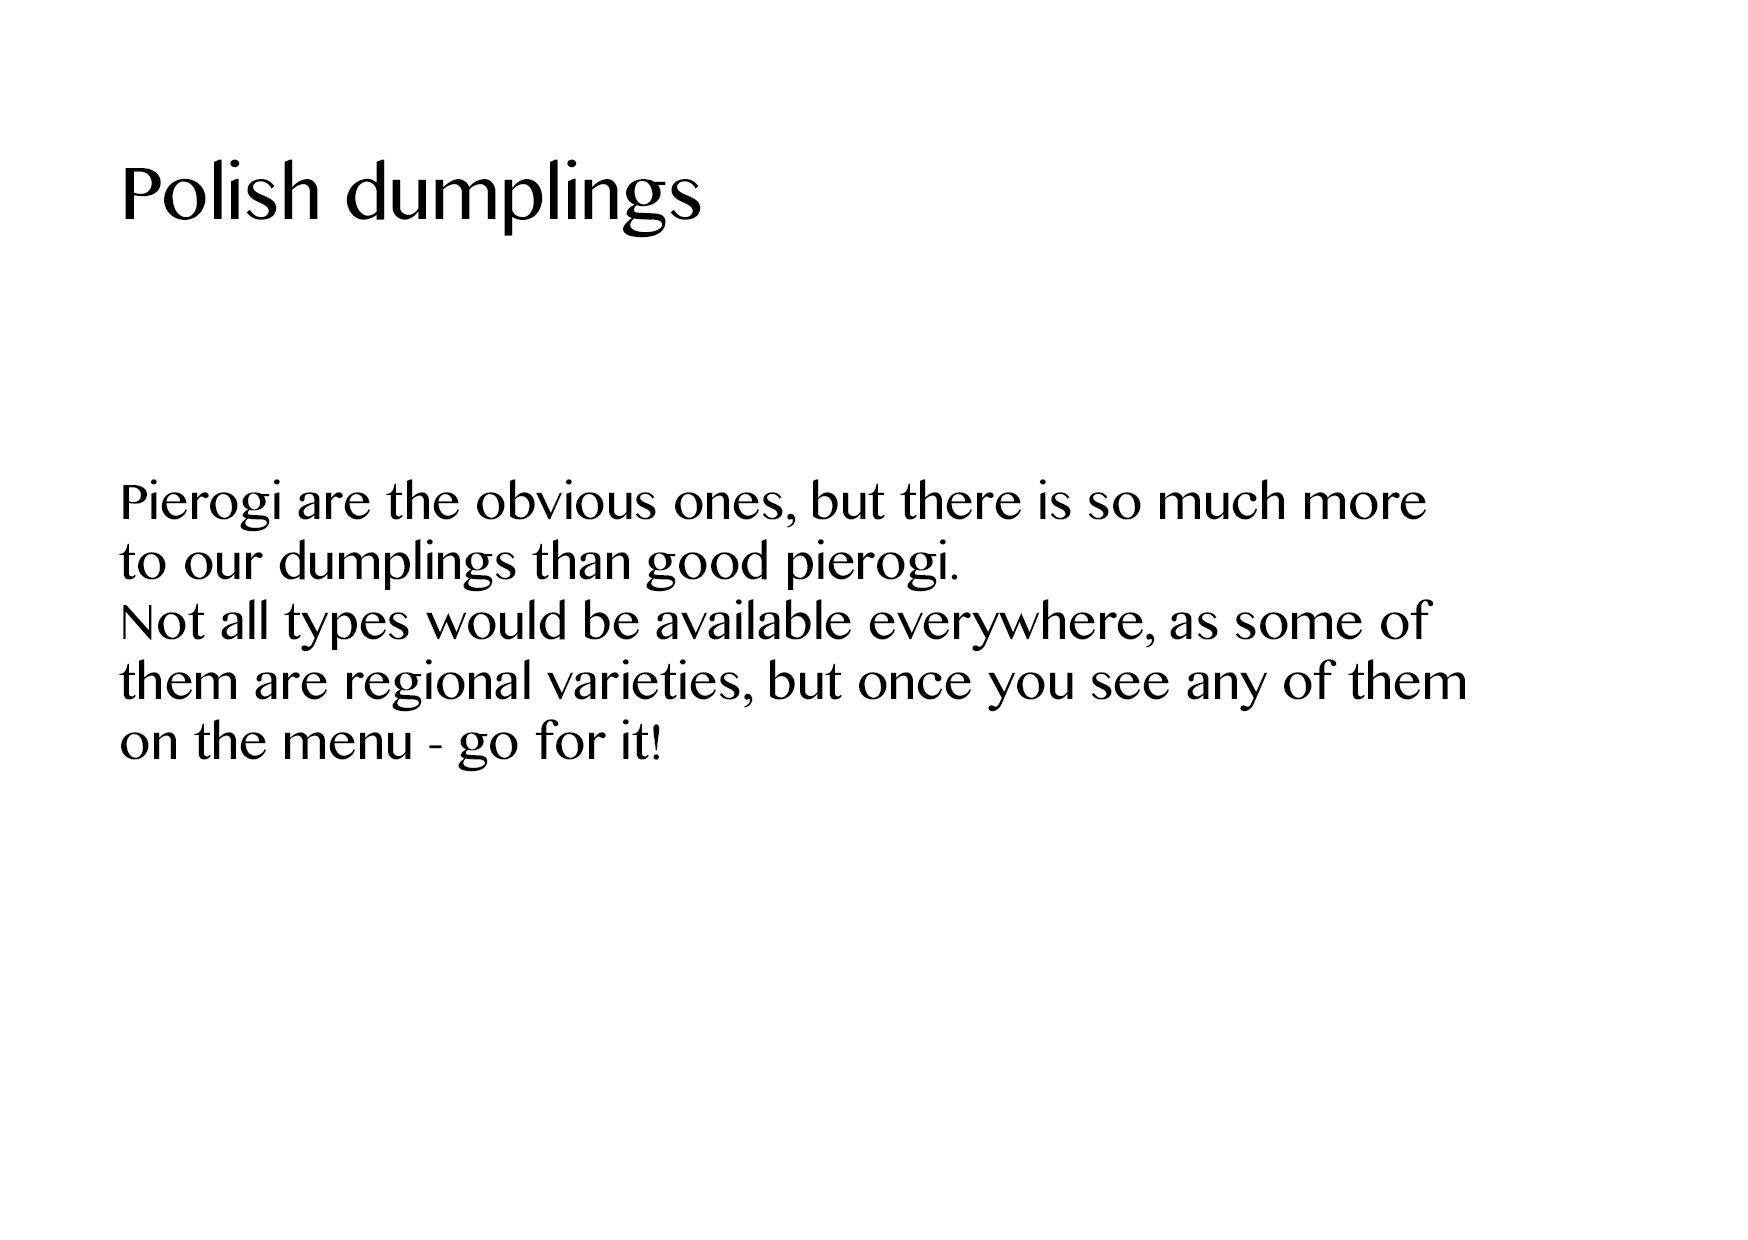 polish dumplings slajd